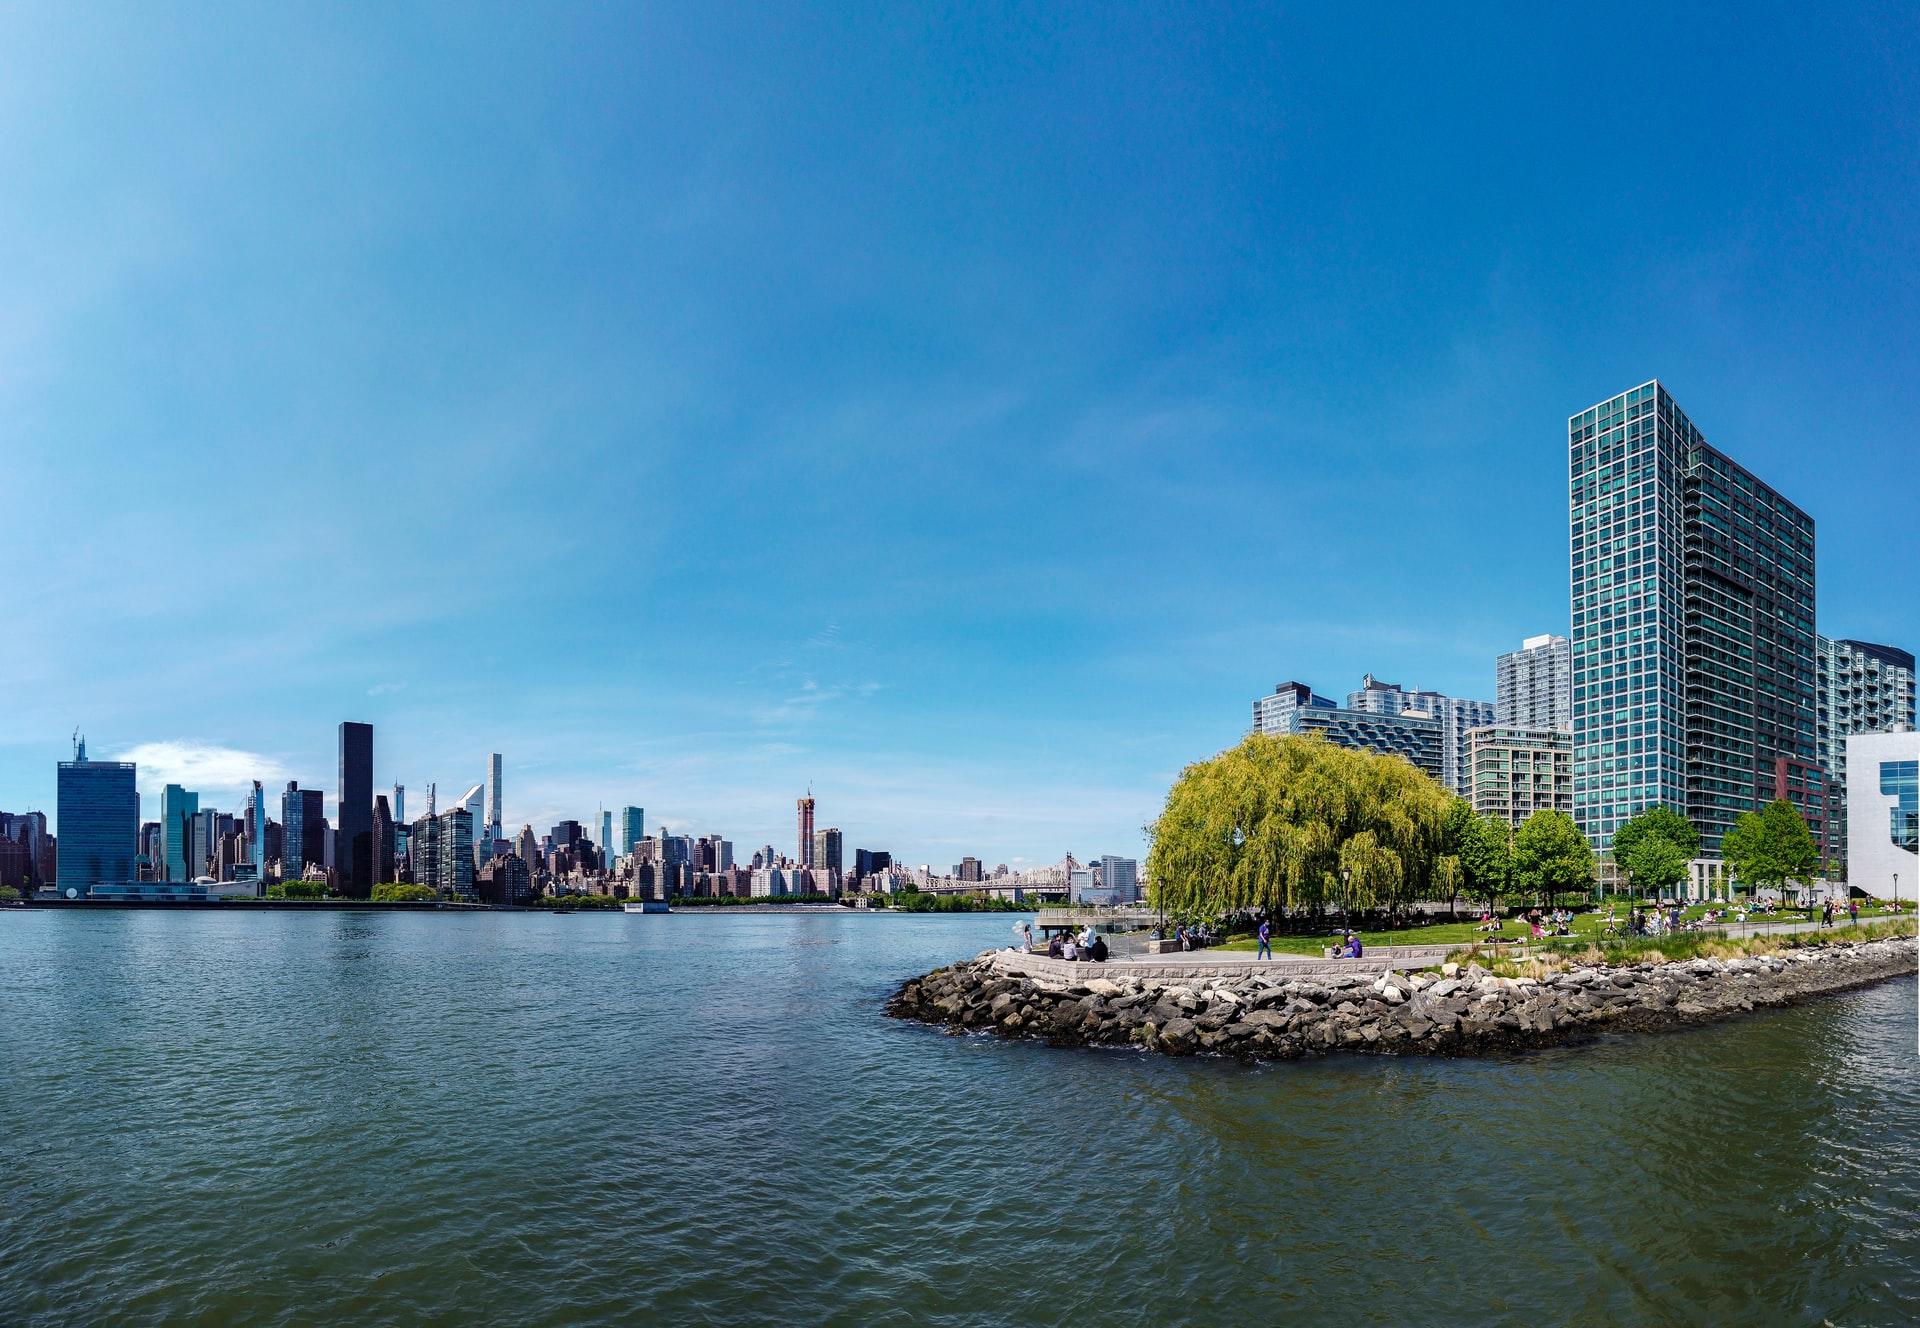 nyc-long-island-city